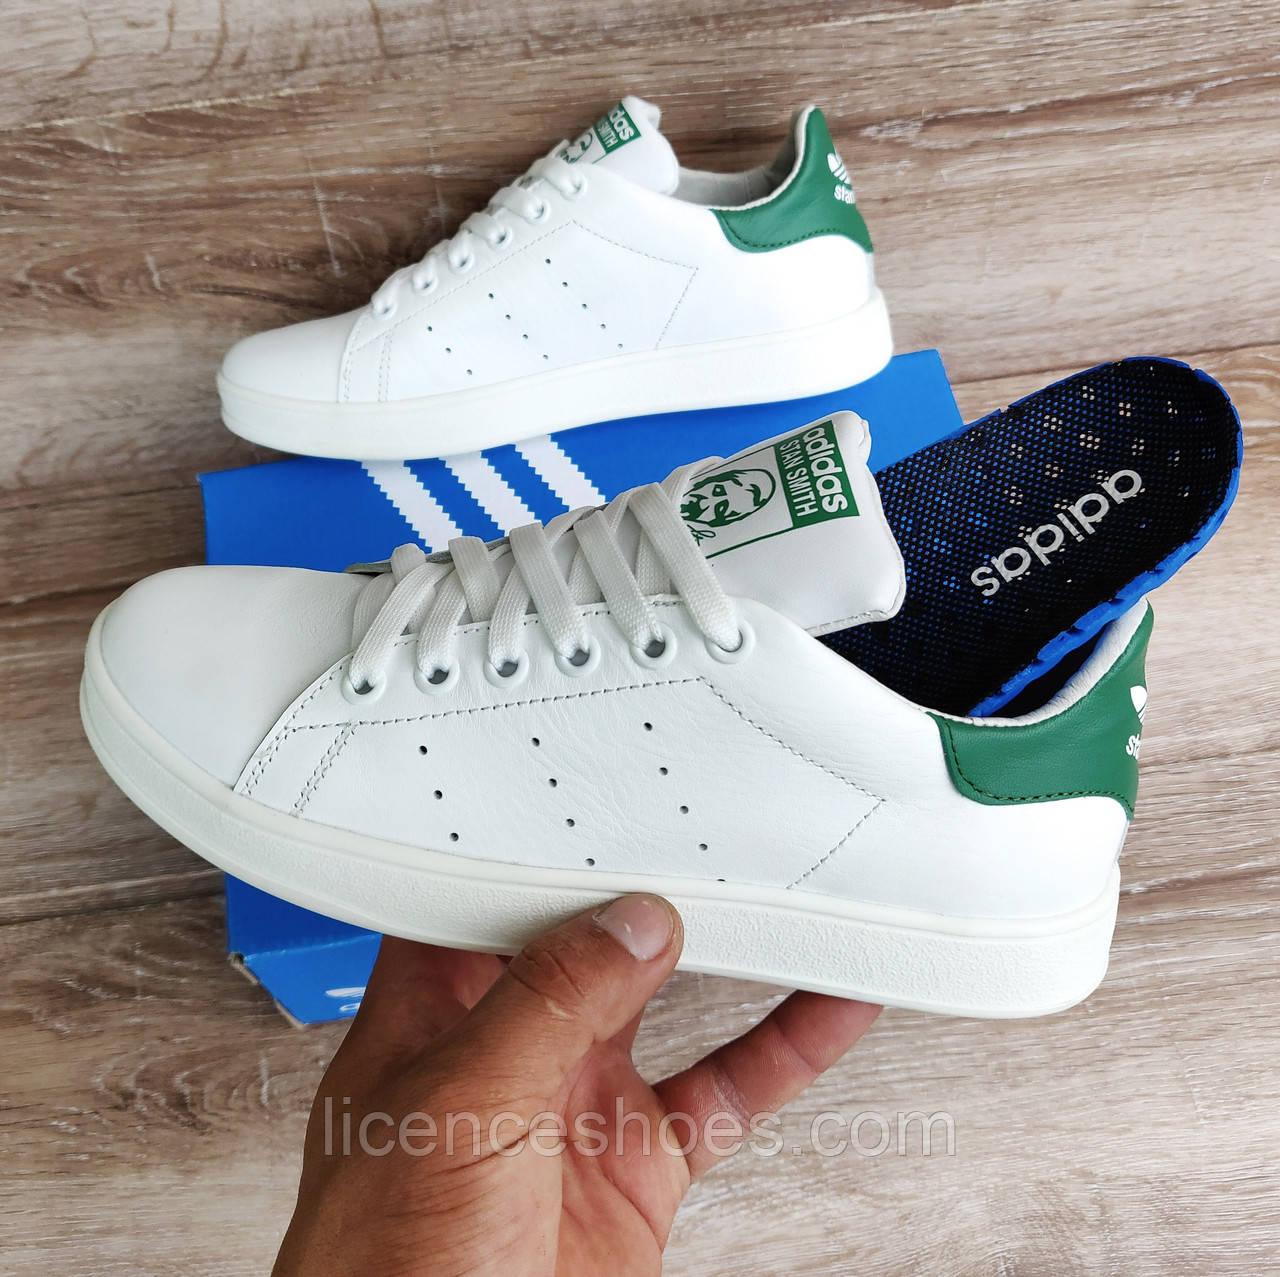 Жіночі кросівки Adidas Stan Smith White Green. Натуральна шкіра